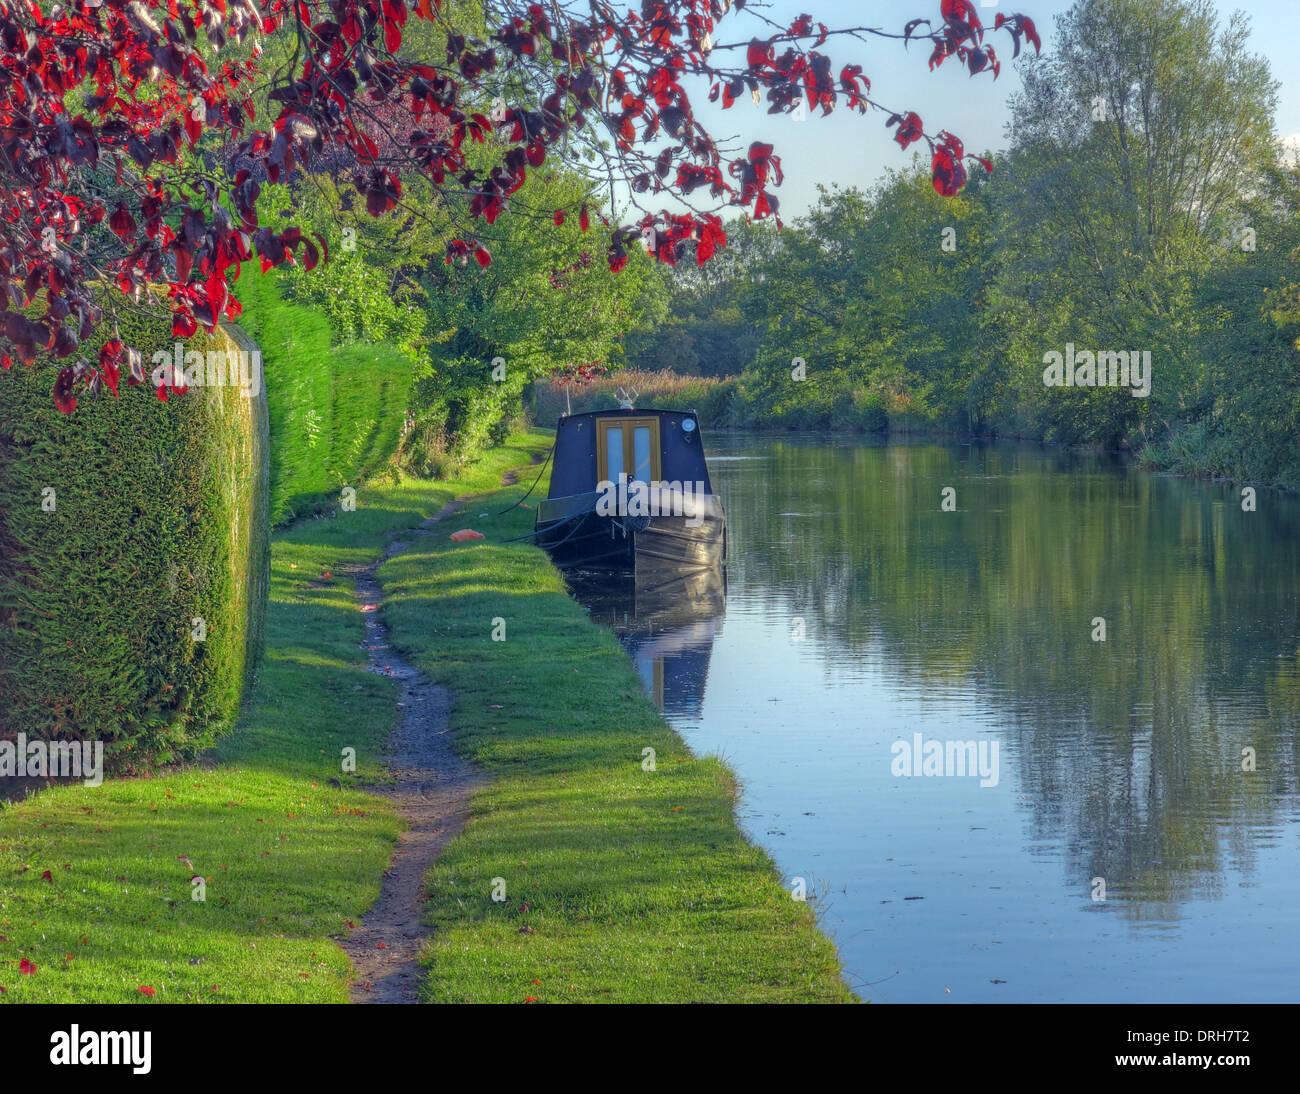 Laden Sie dieses Alamy Stockfoto Grappenhall Frühling Bridgewater Canalside Szene, Cheshire, England, UK - DRH7T2